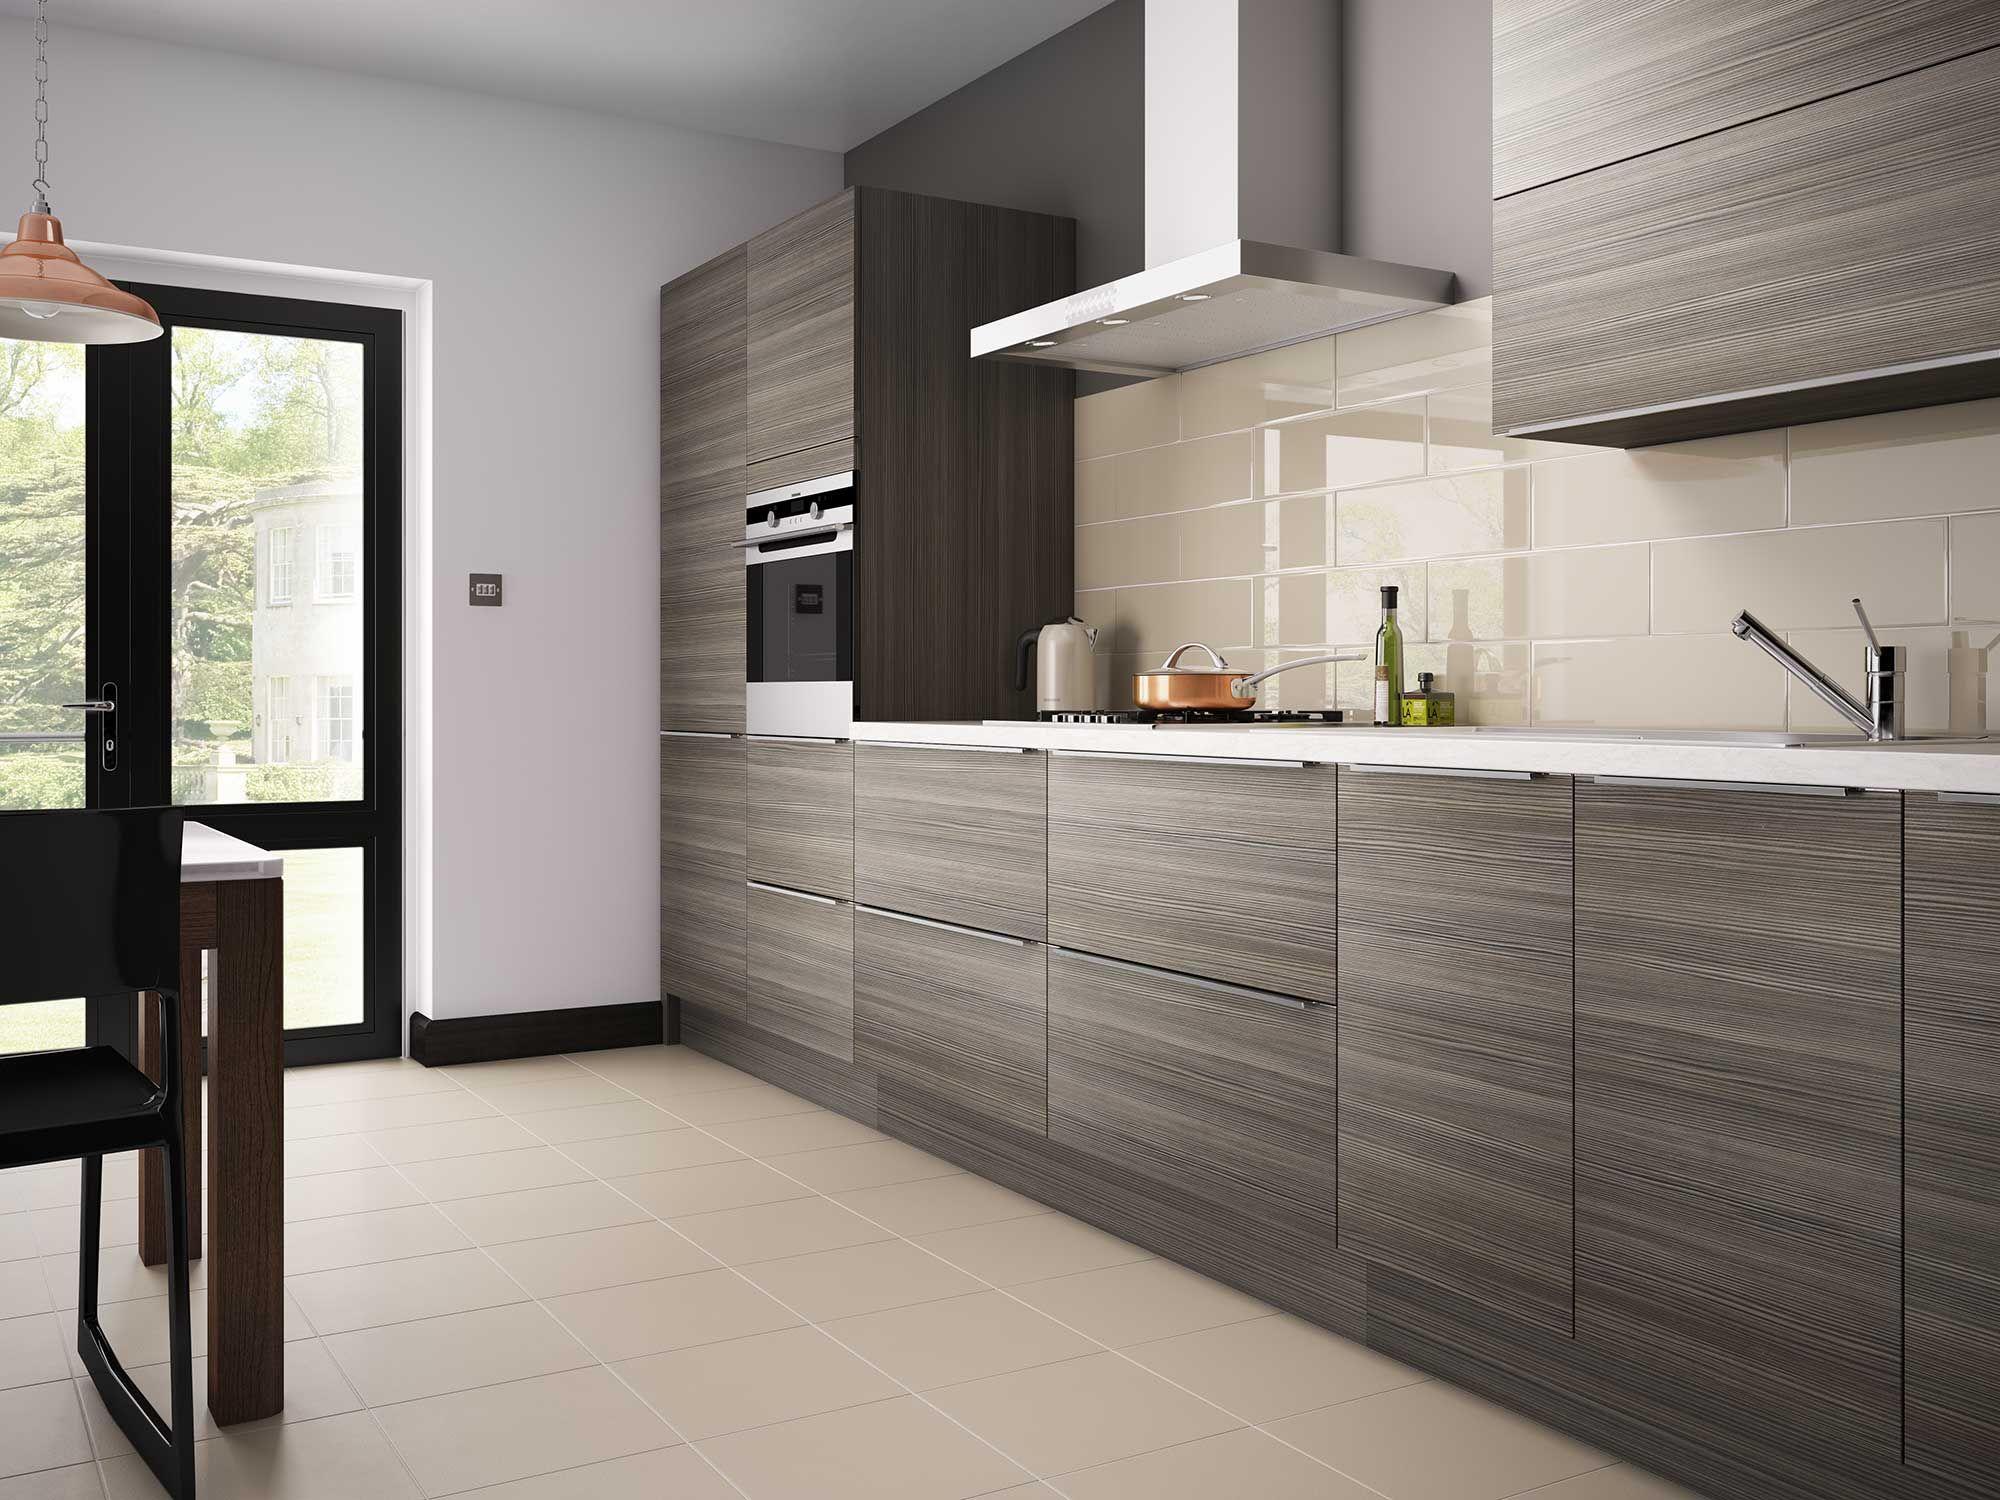 Modesfine In Cream Is Available In 13X13 Satin Matte Floor Entrancing 10 X 20 Kitchen Design Decorating Design